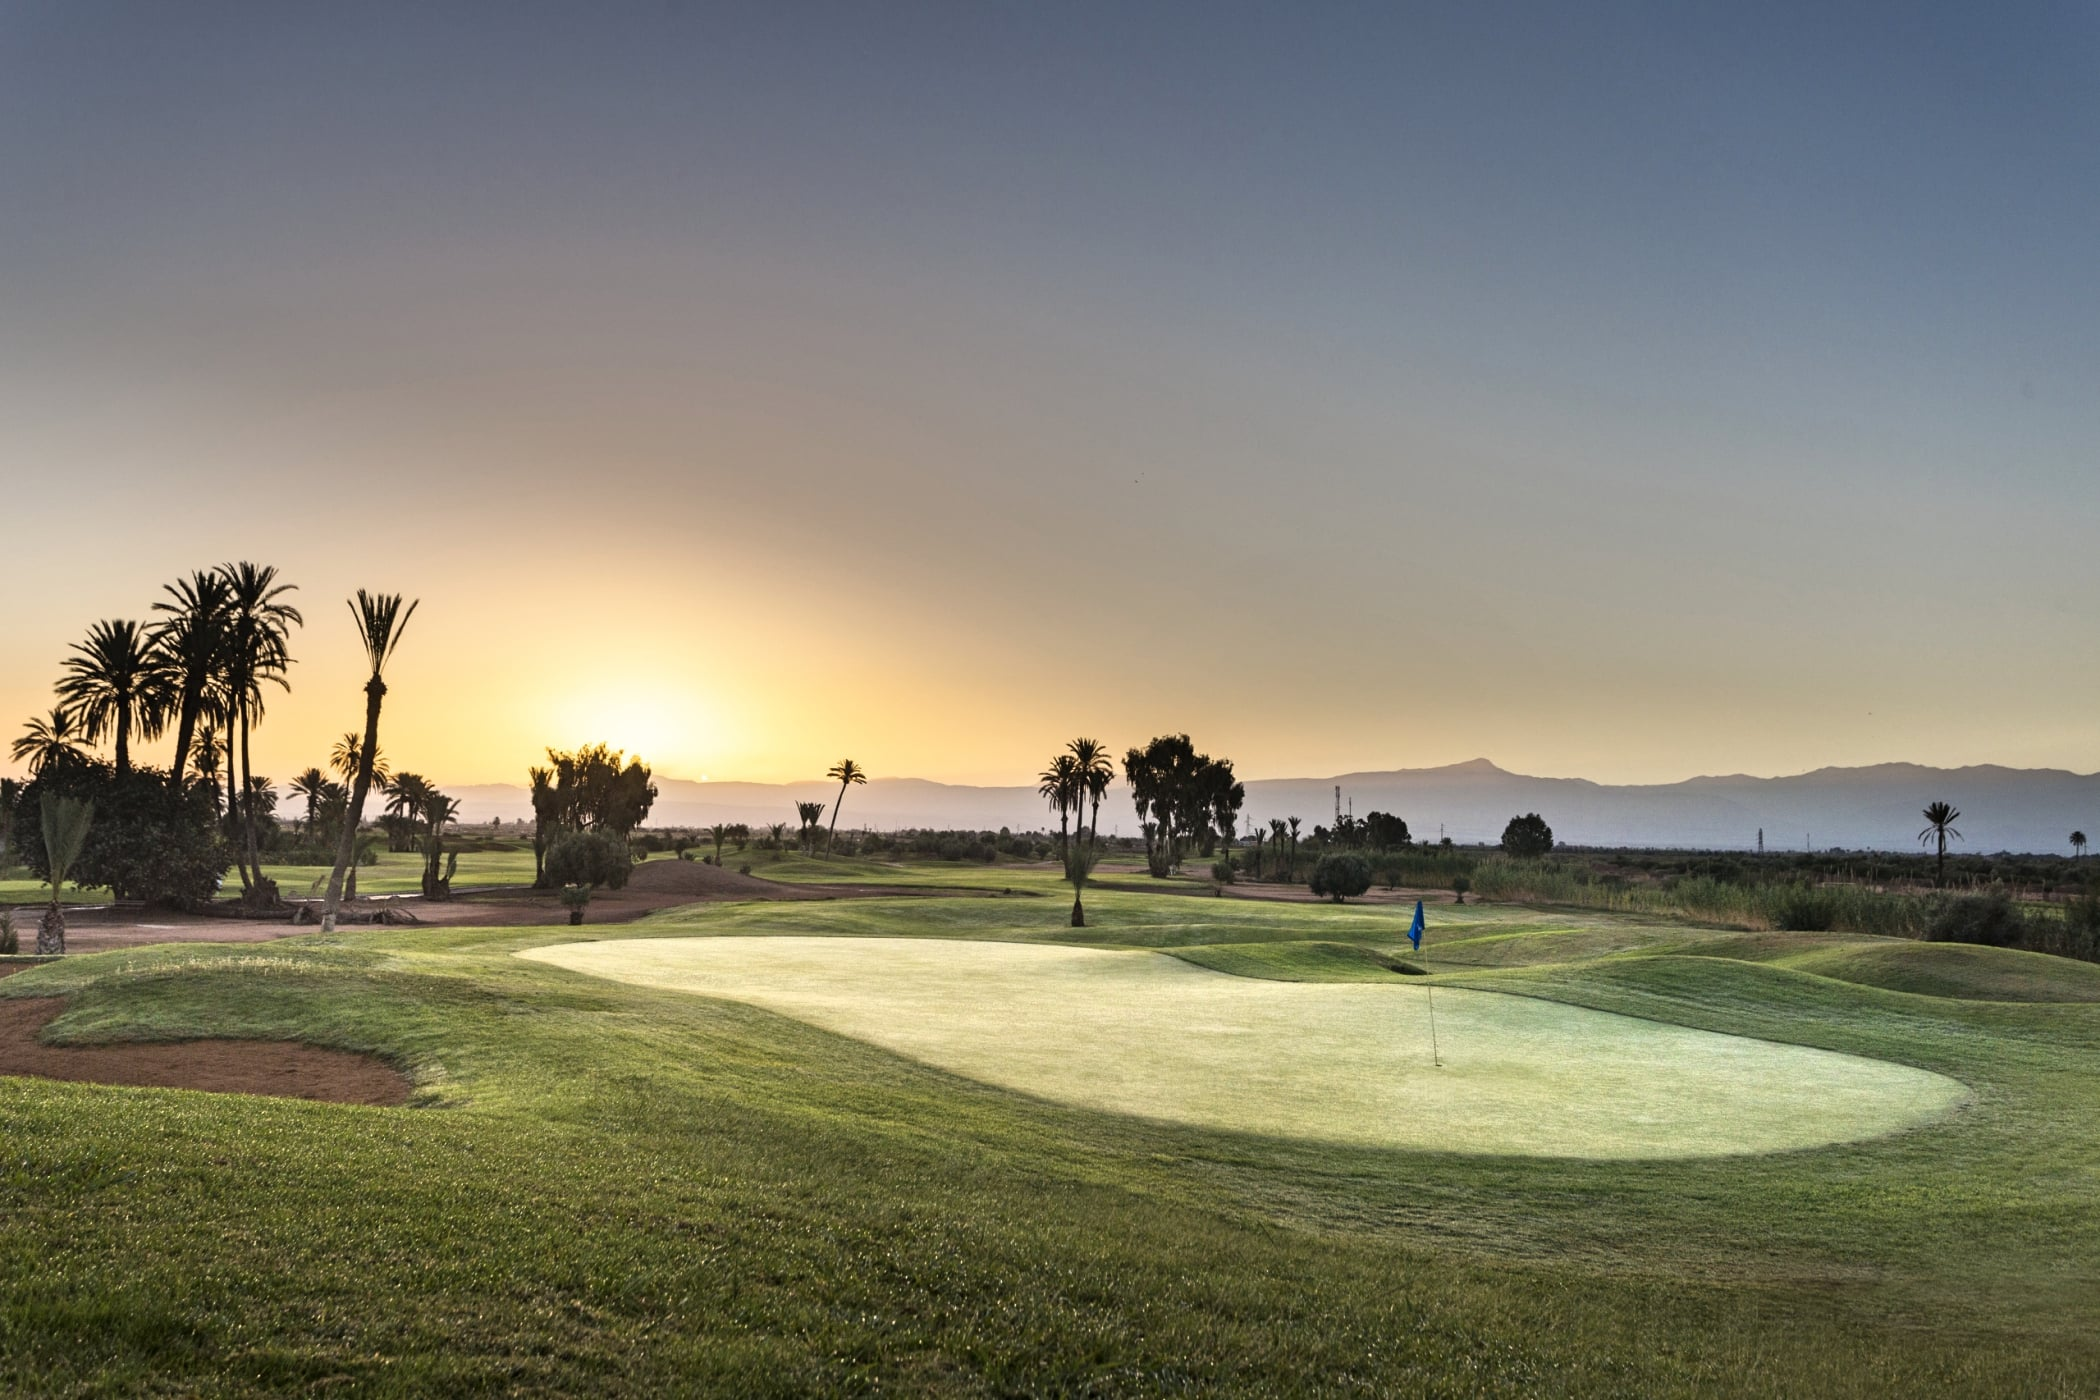 Amanjena_Morocco_Marrakech_Golf_fivestardestination_five_star_destination_1